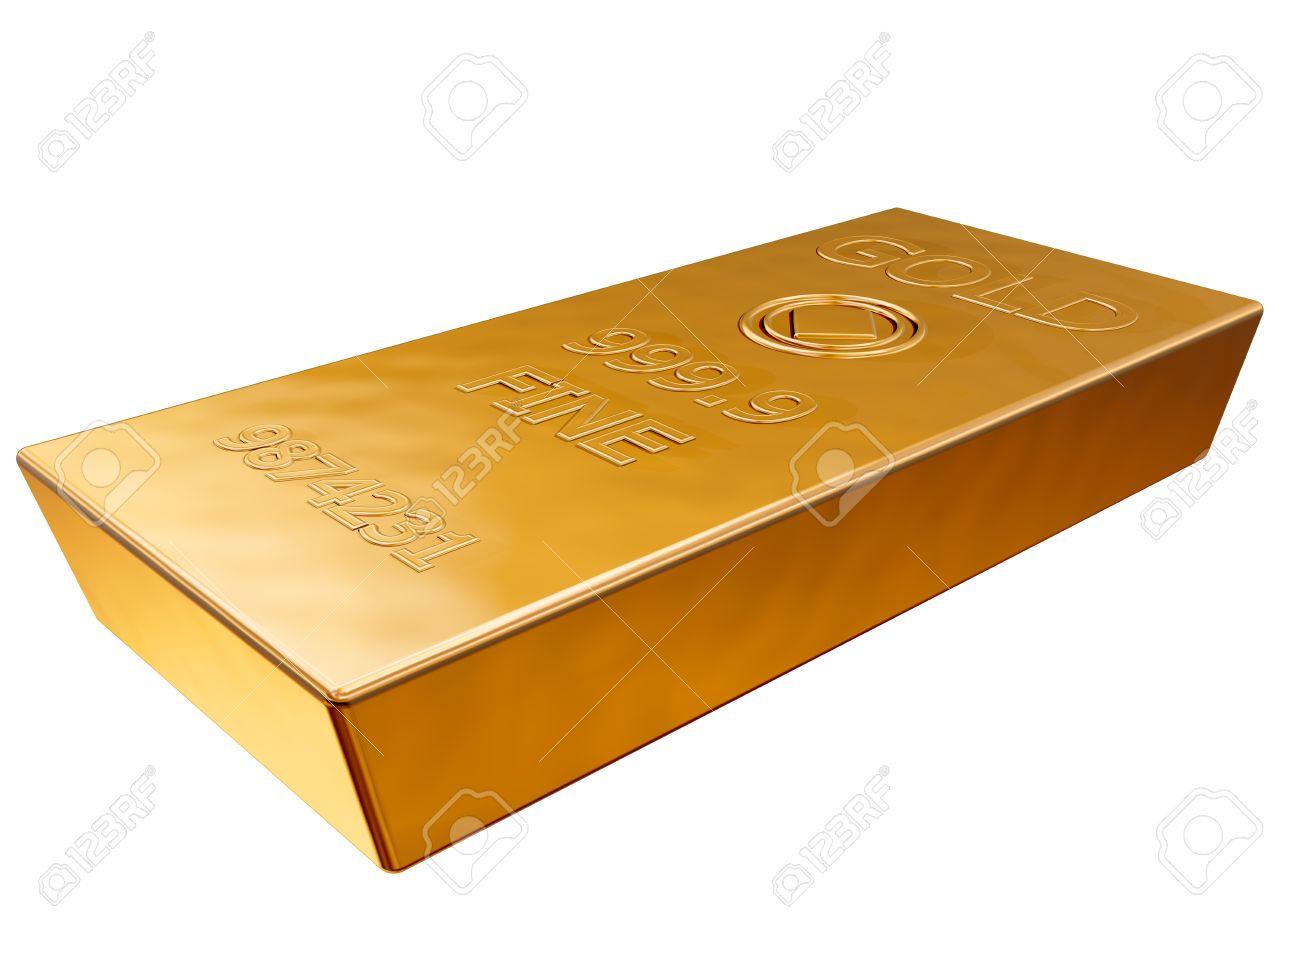 Isolated illustration of a pure gold ingot Stock Illustration - 11854089